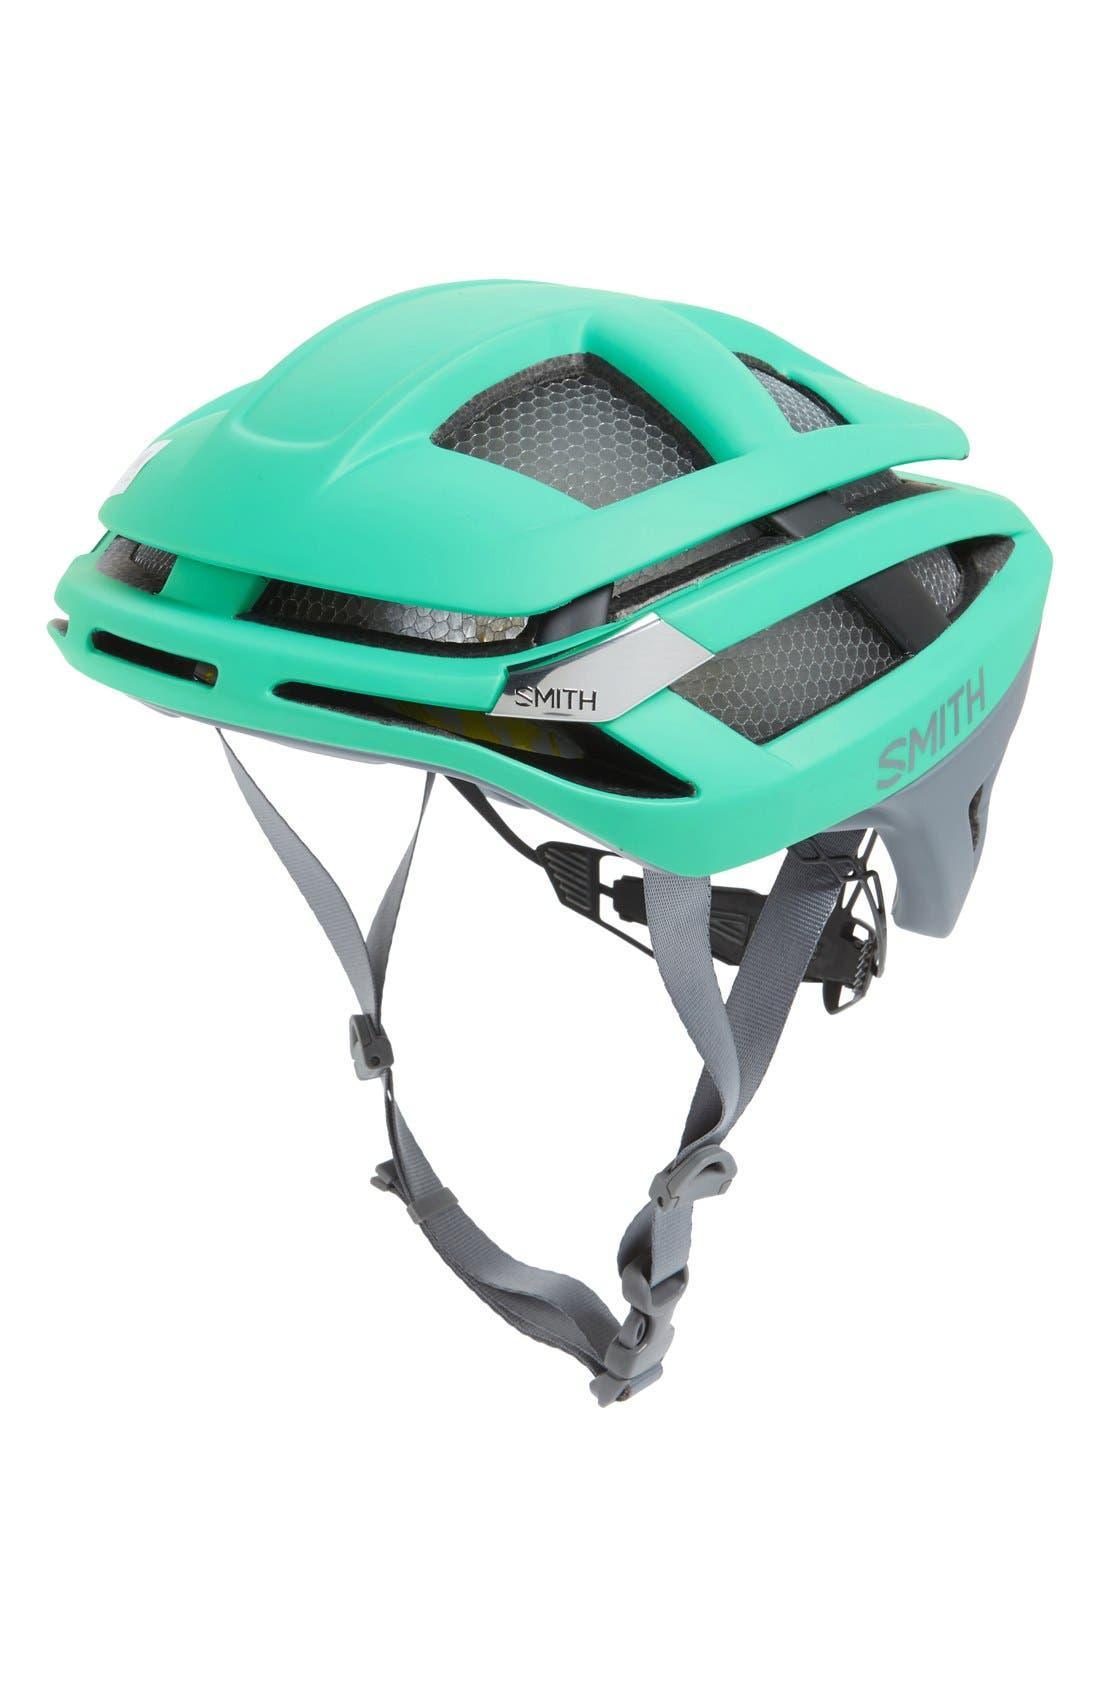 'Overtake with MIPS' Biking Racer Helmet,                             Main thumbnail 1, color,                             Matte Opal/ Charcoal